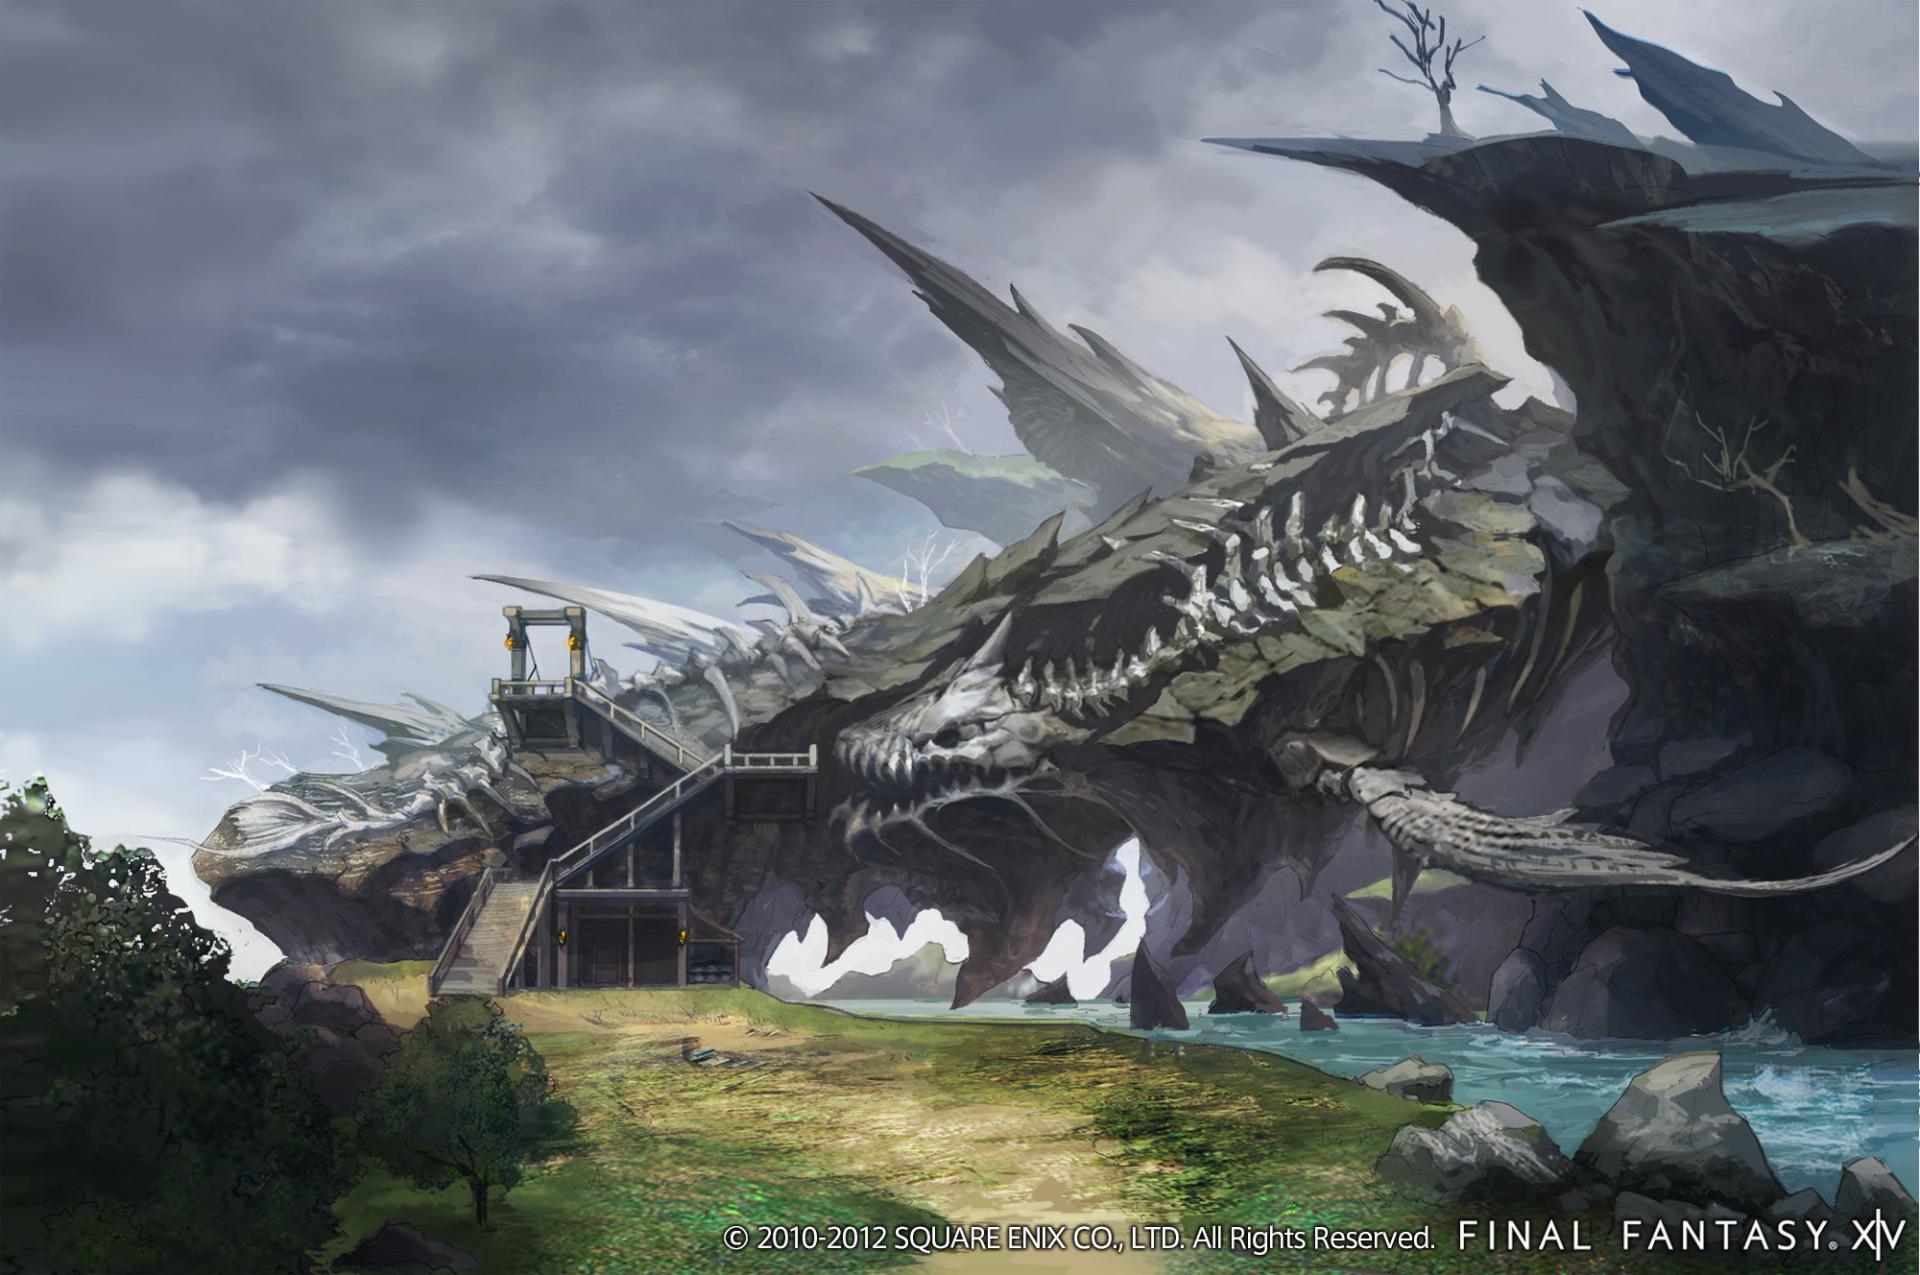 Final Fantasy XIV A Realm Reborn wallpapers HD quality